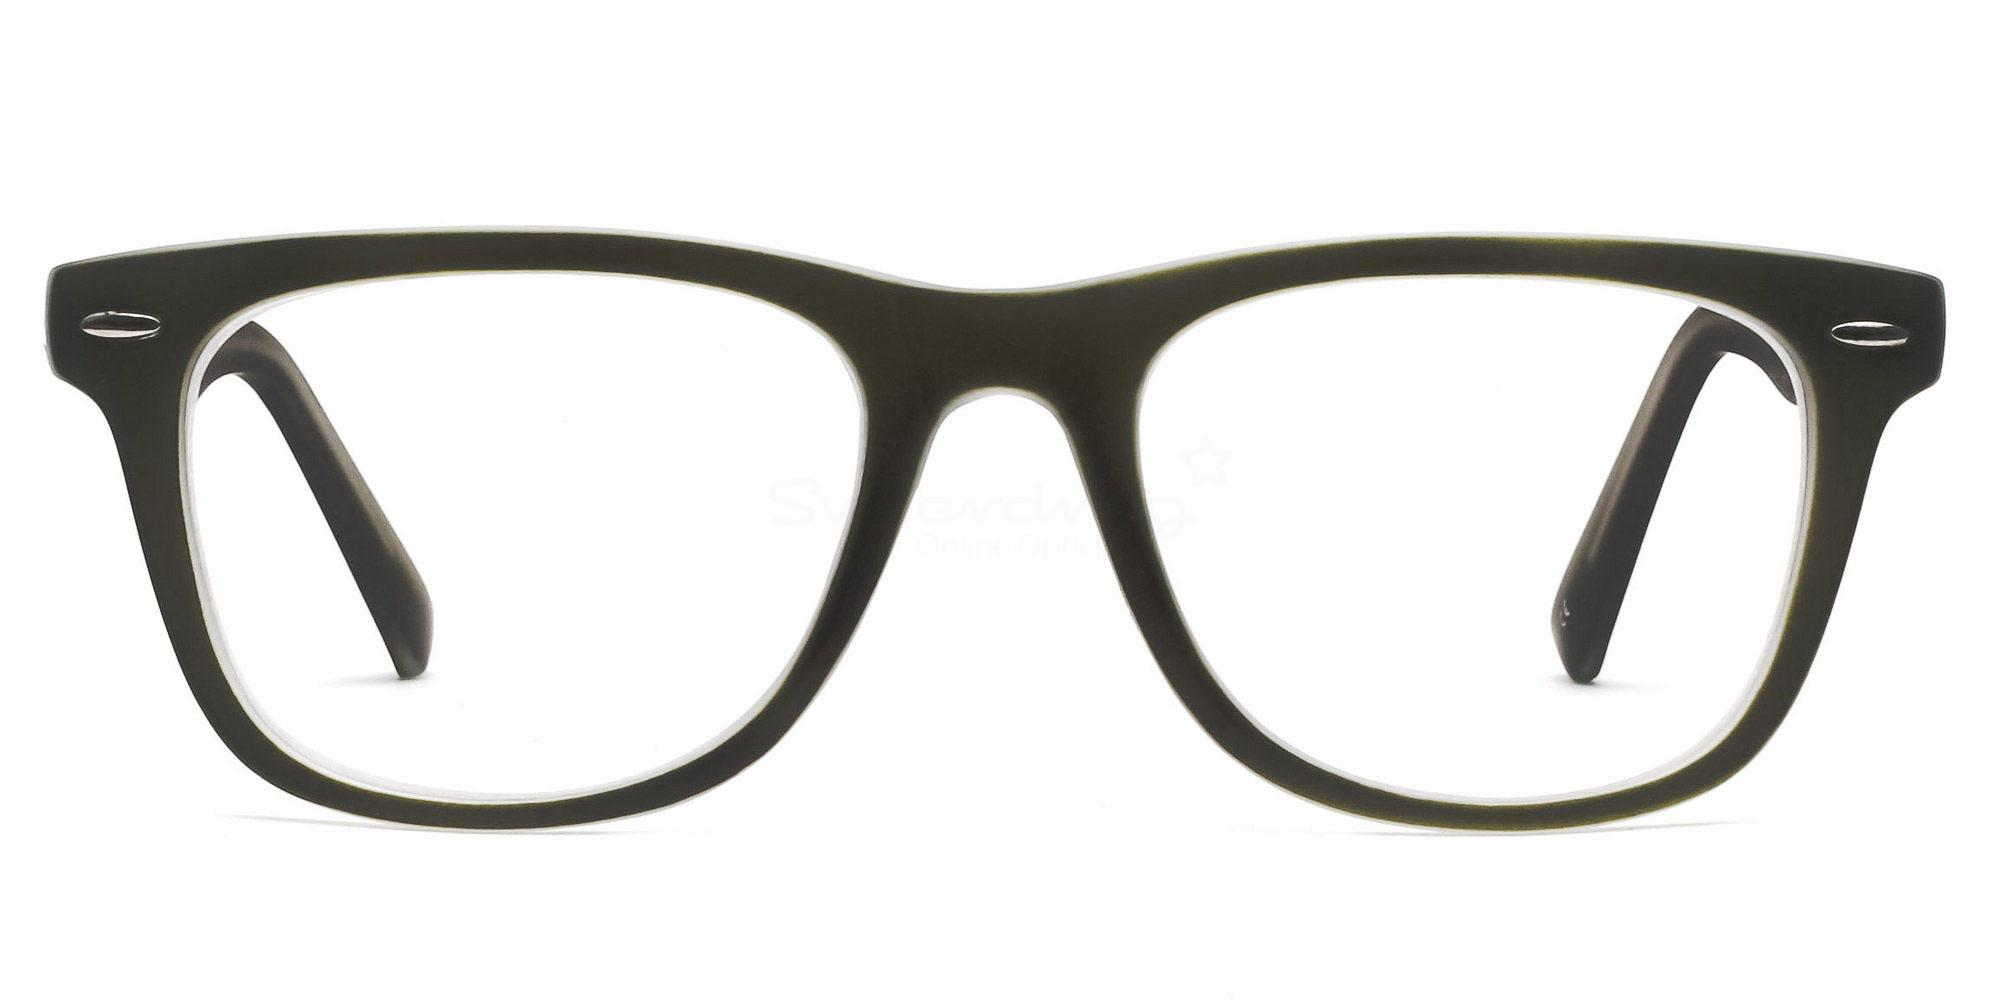 C15 8121 - Combat Green Glasses, Helium